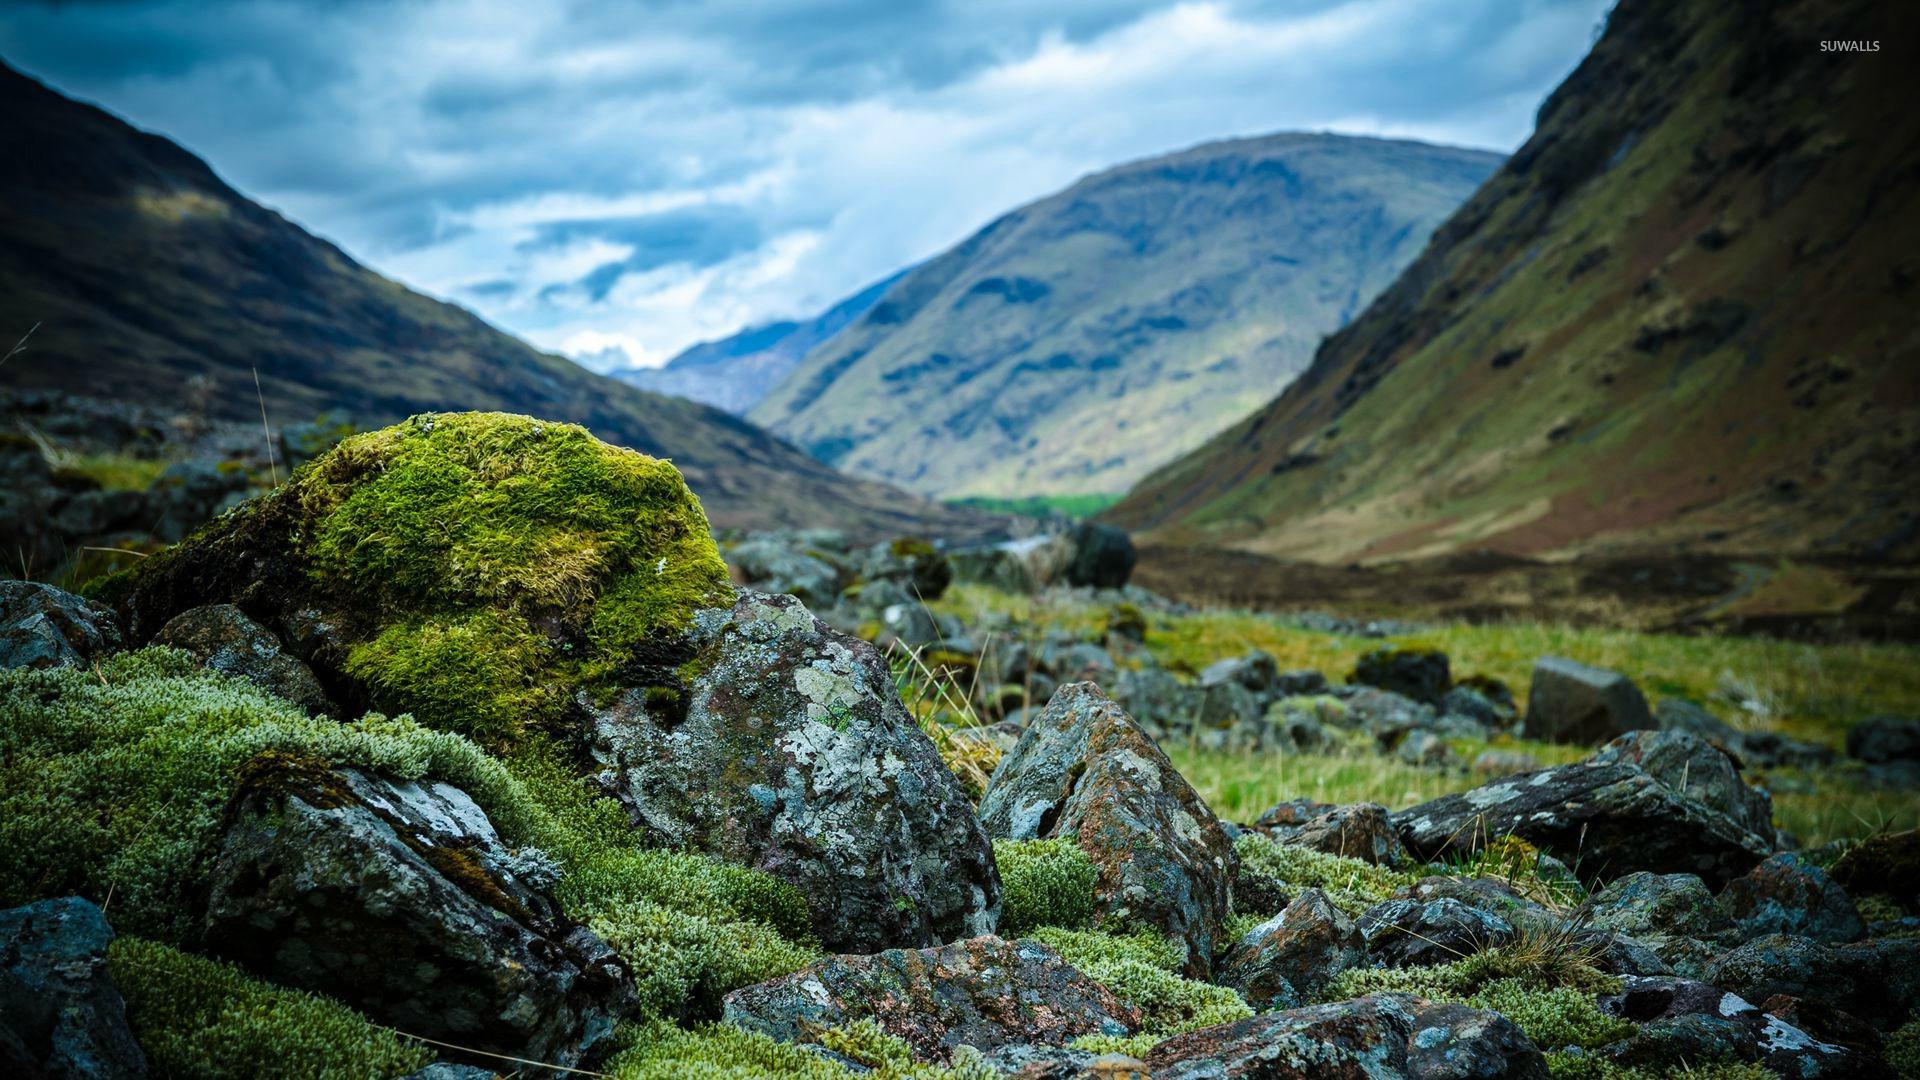 Rocky mountain wallpaper - Nature